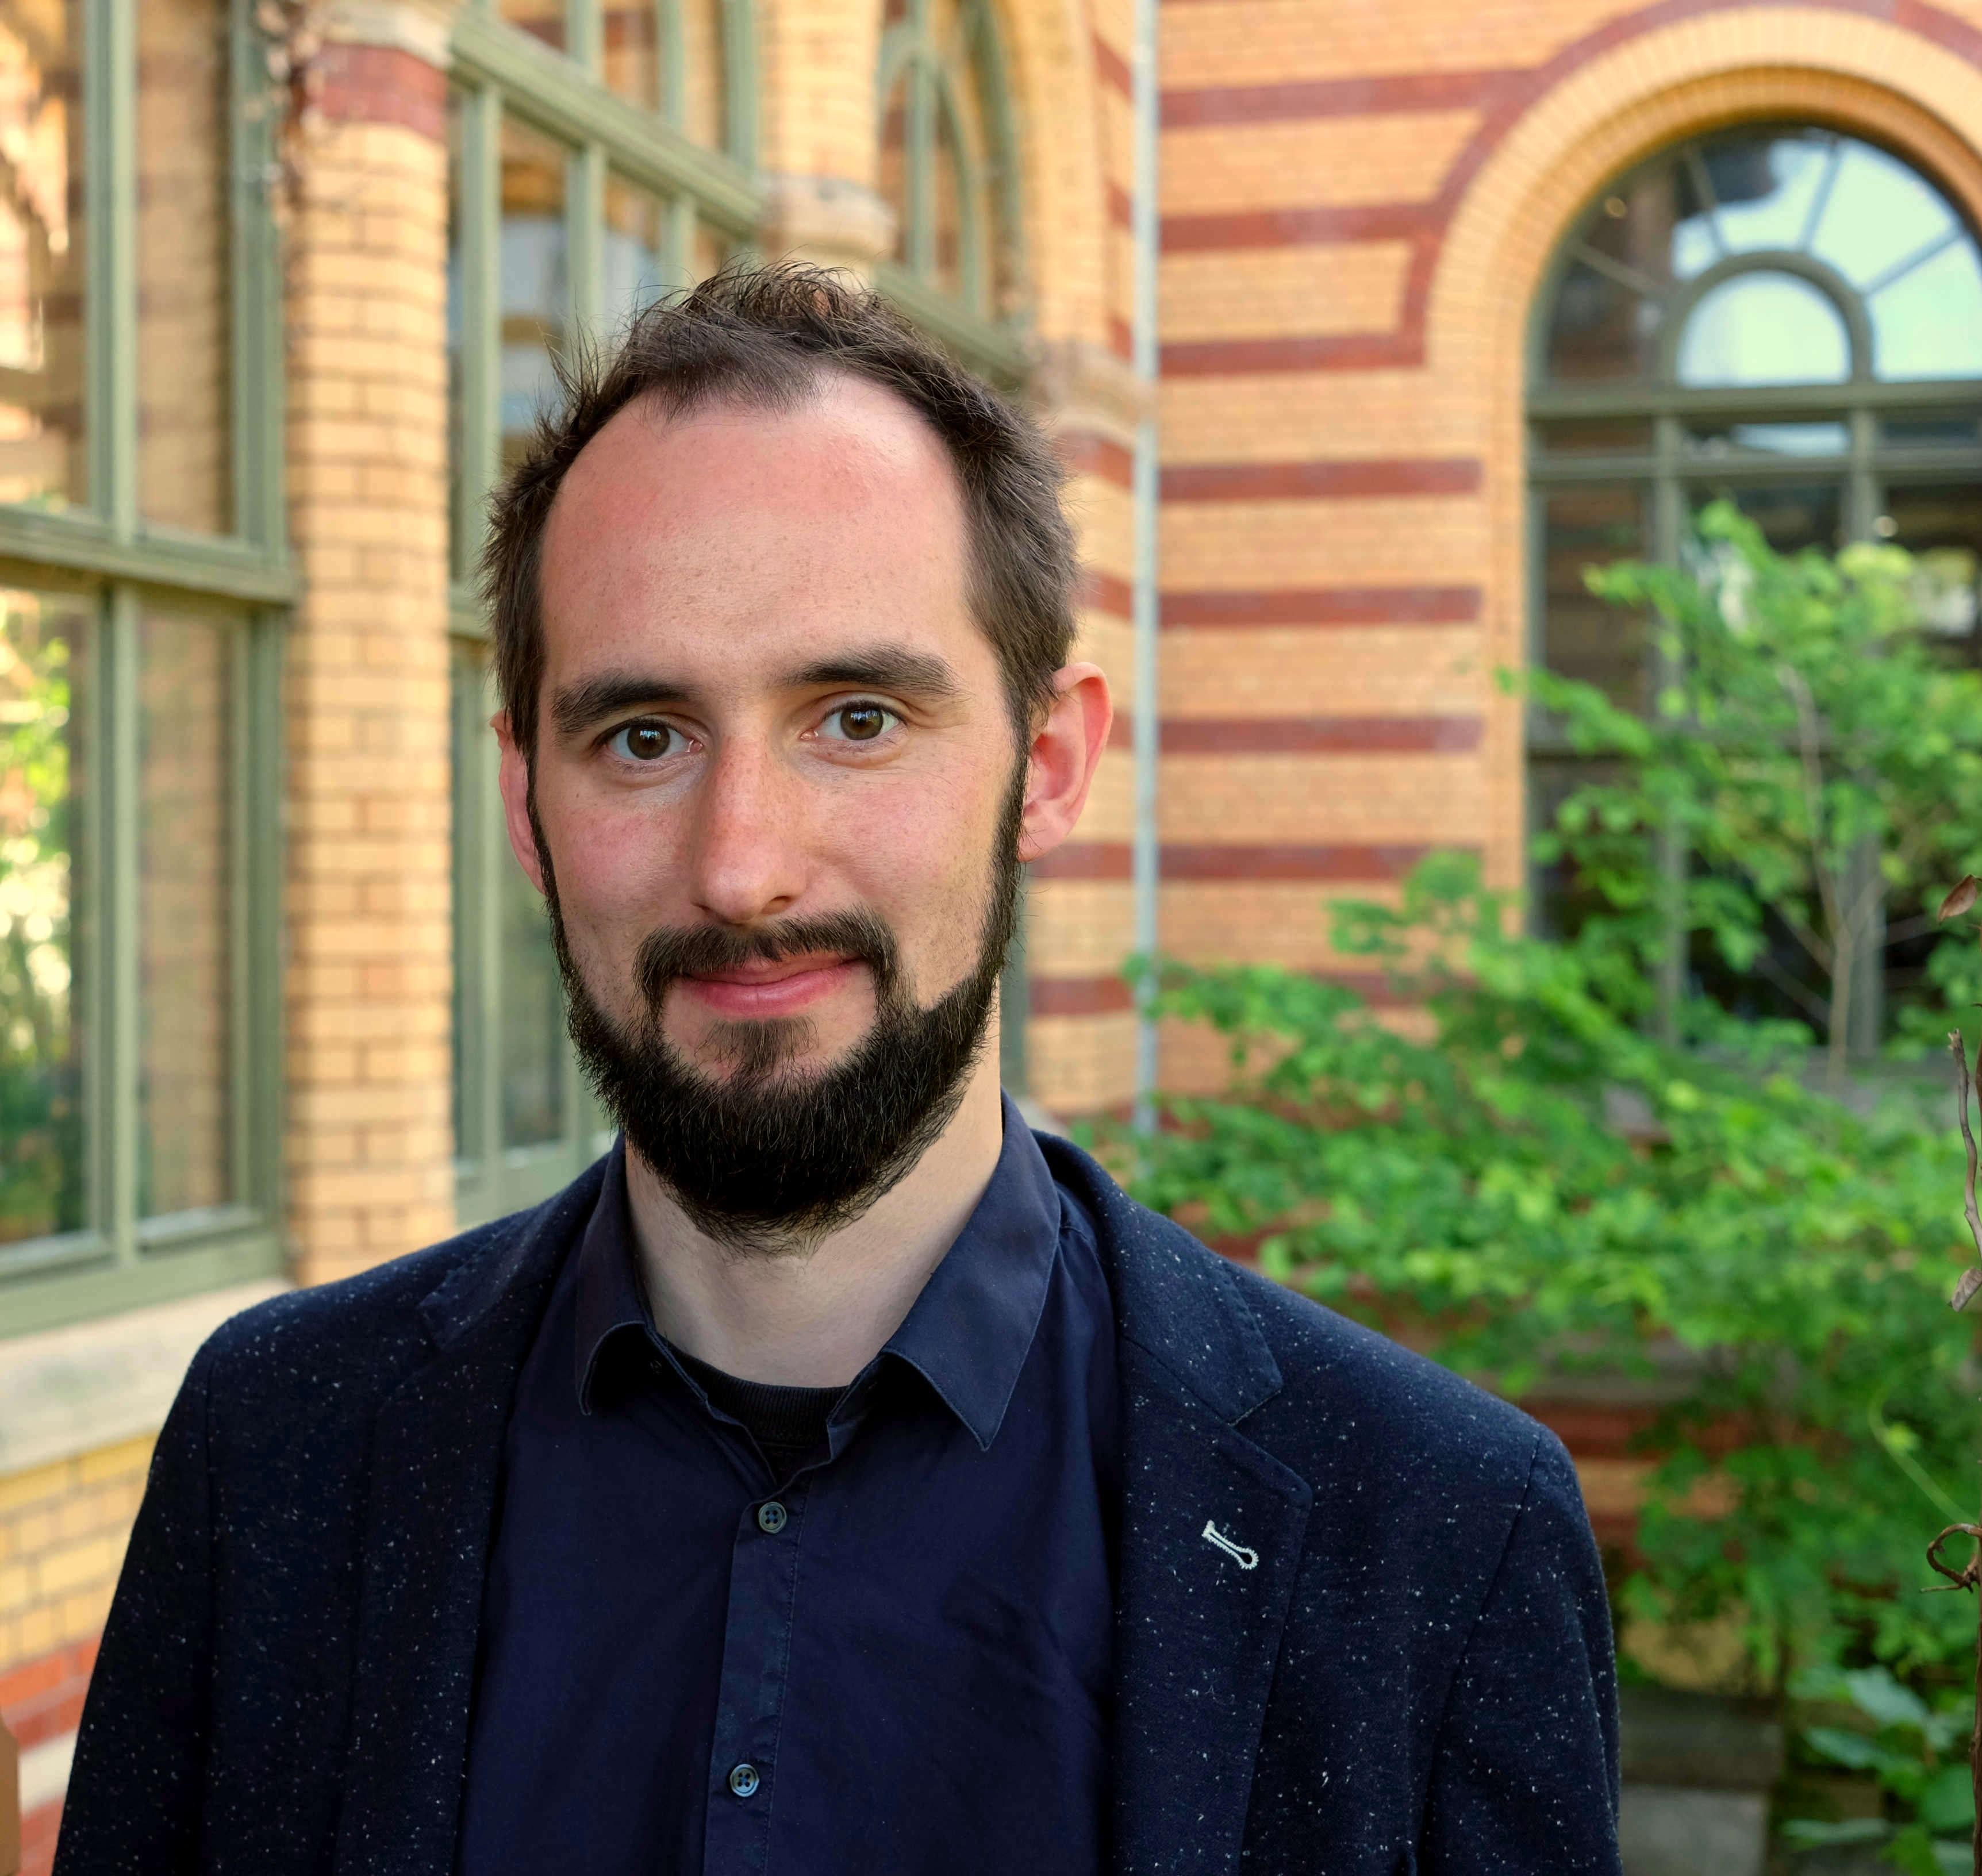 Professorship at the University of Kassel for agricultural researcher Christoph Gornott